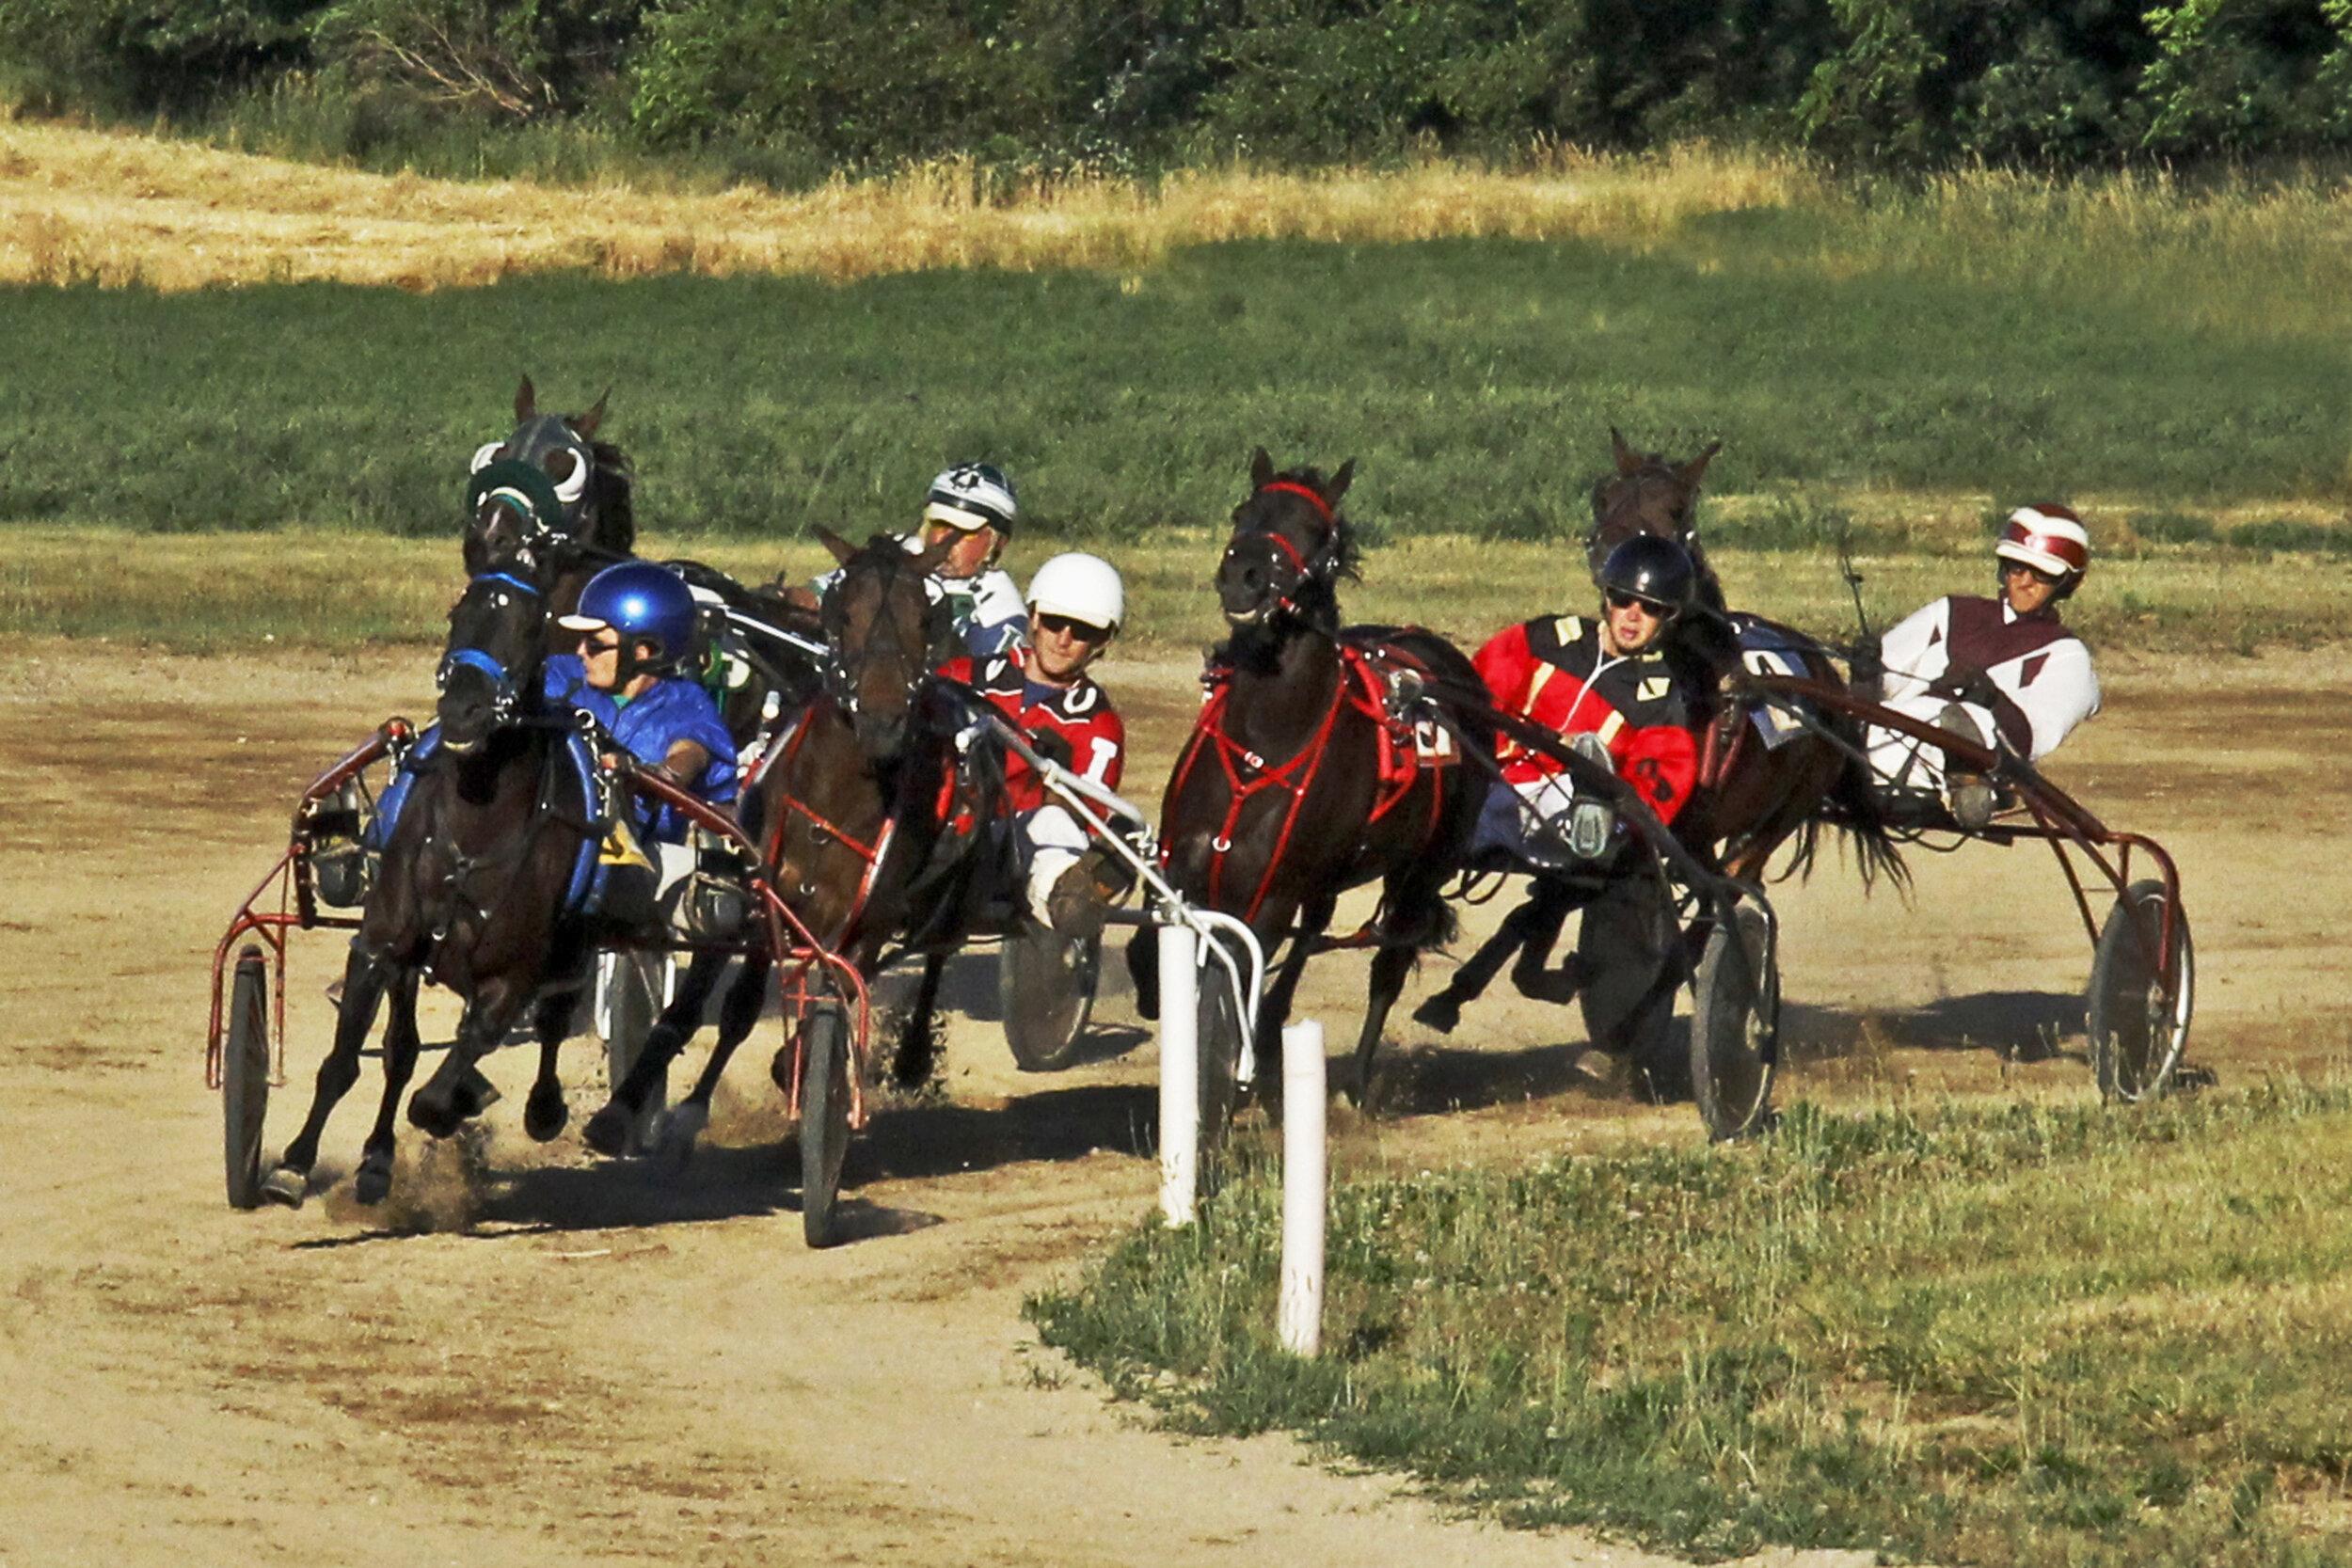 Jim McClean - Pony Sulkie Race